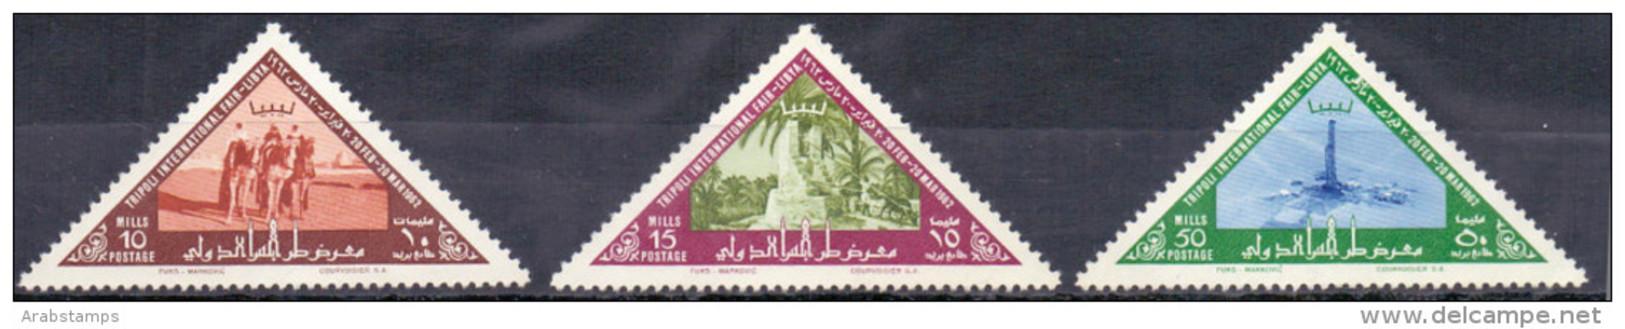 1962 Libya Tripoli International Fair Complete Set 3 Values MNH    (Or Best Offer) - Libye